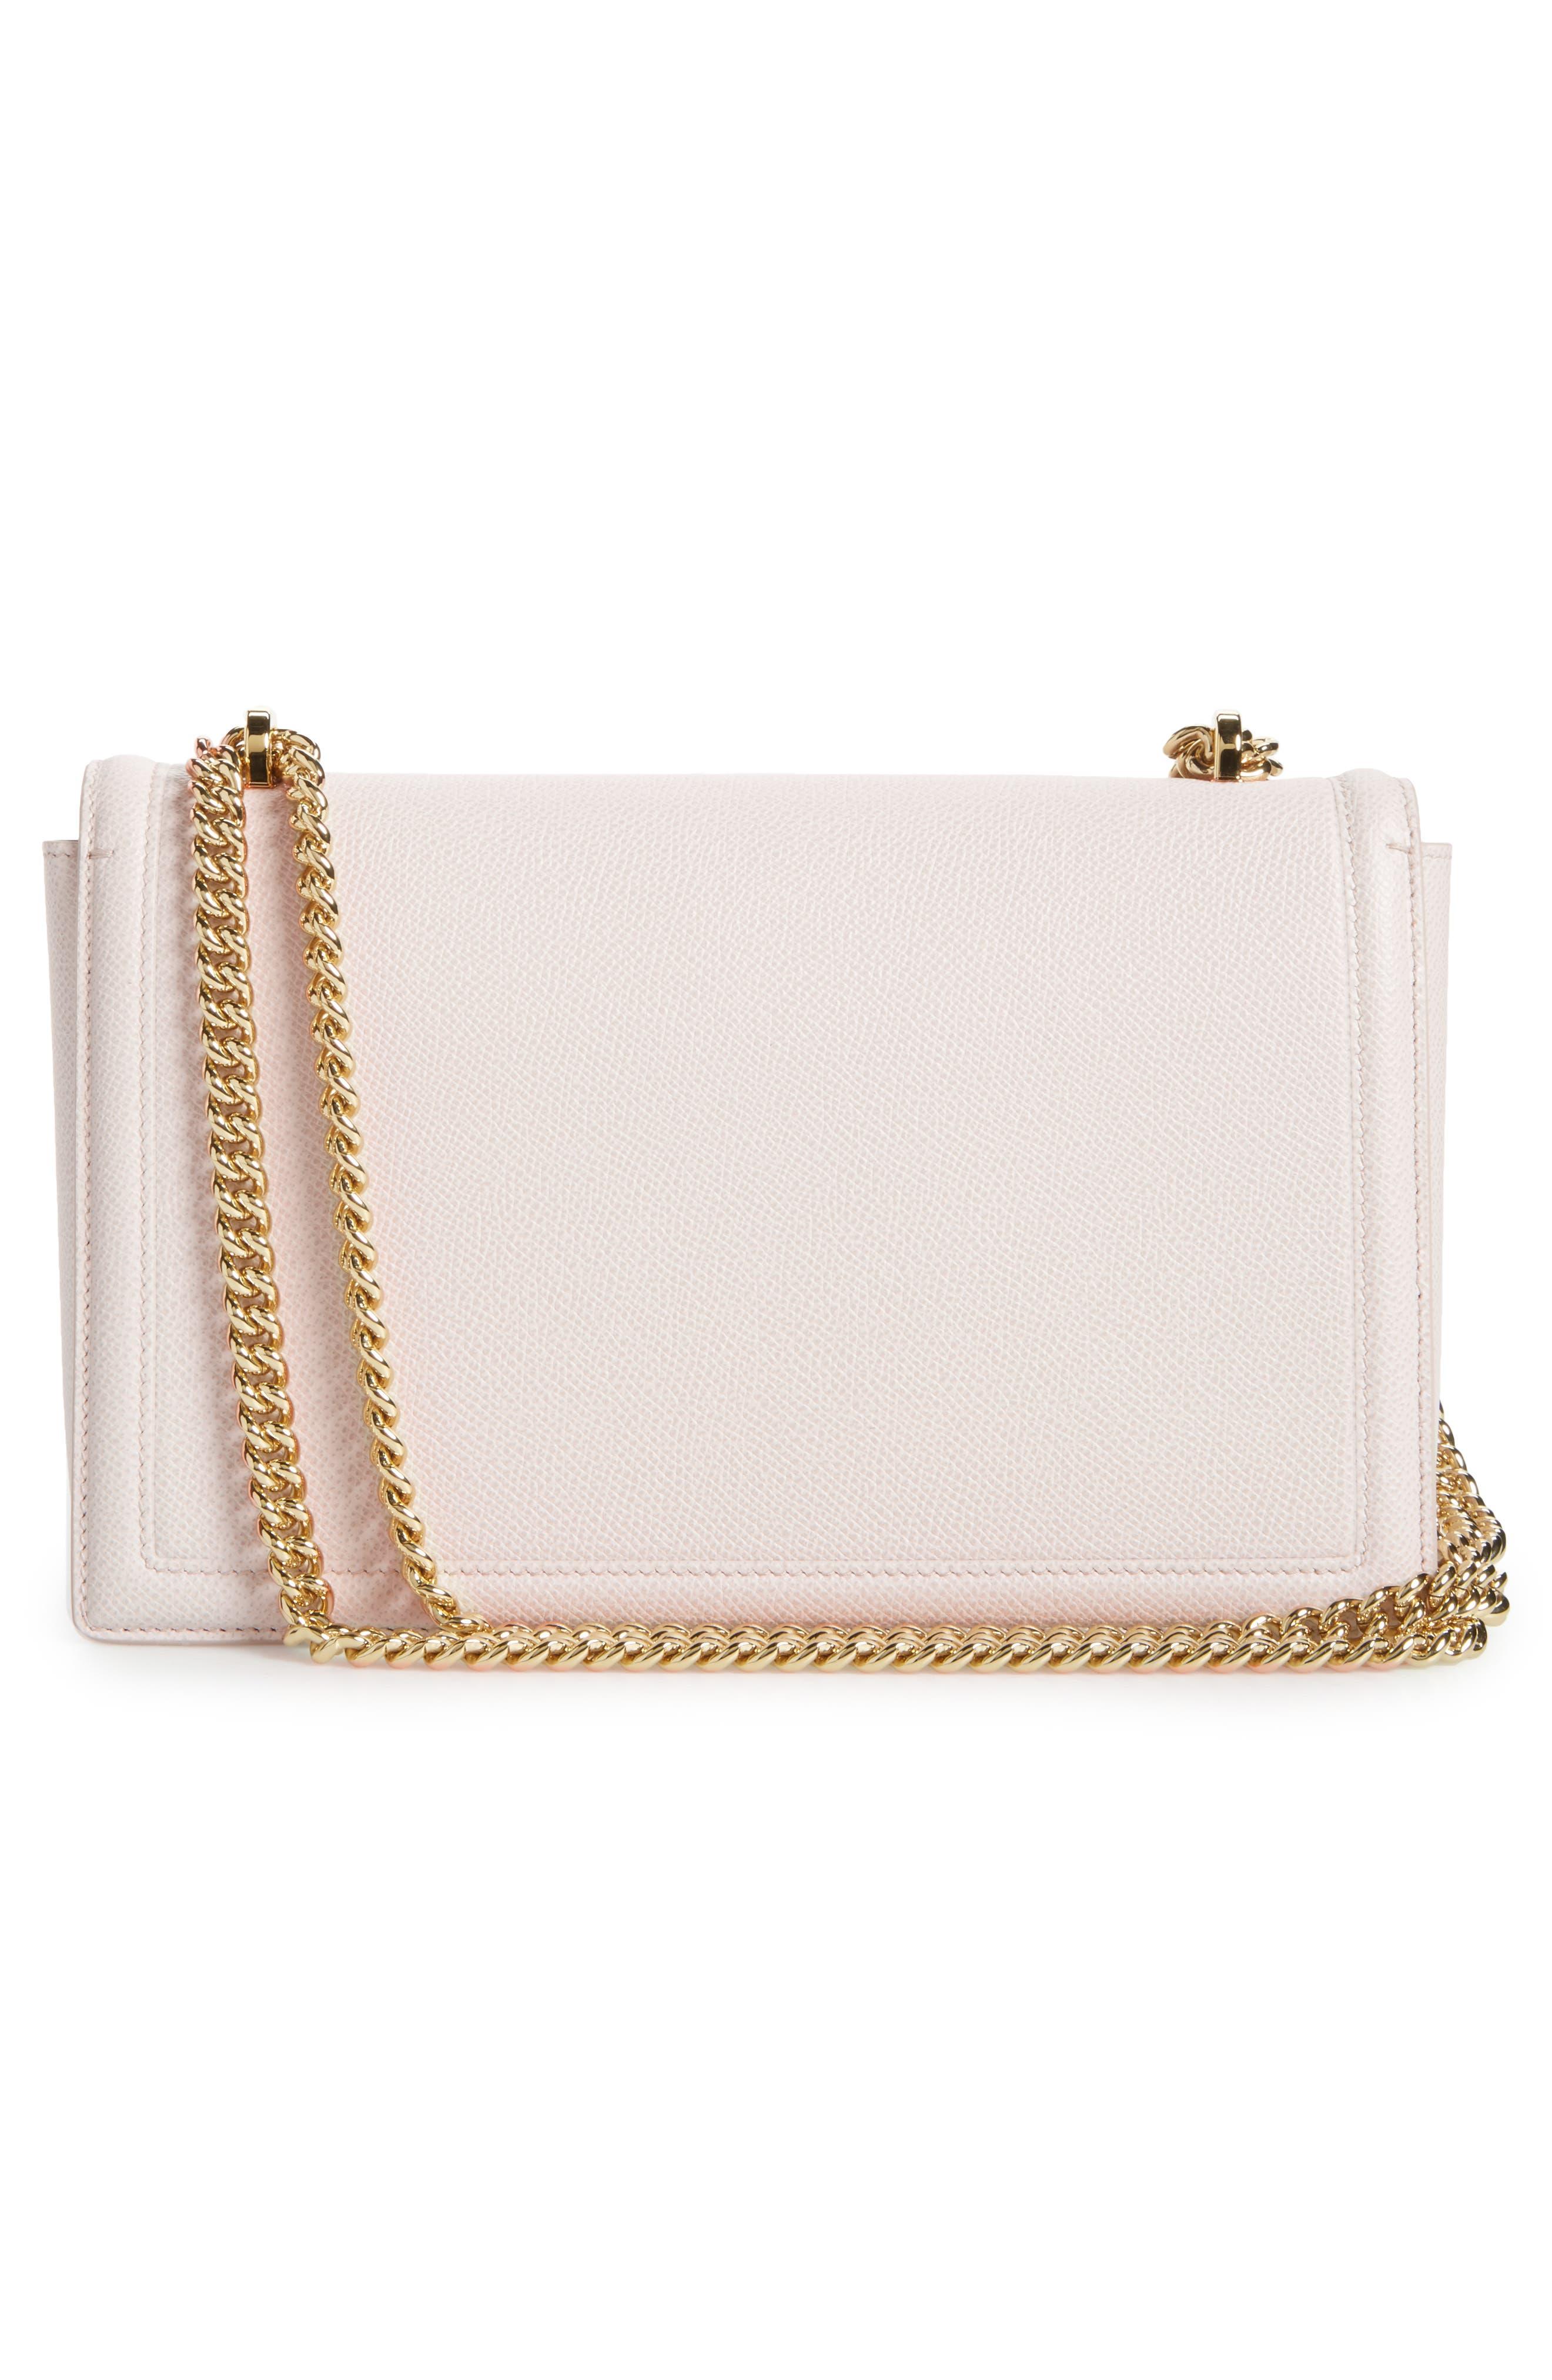 Medium Ginny Leather Shoulder Bag,                             Alternate thumbnail 3, color,                             Jasmine Flower